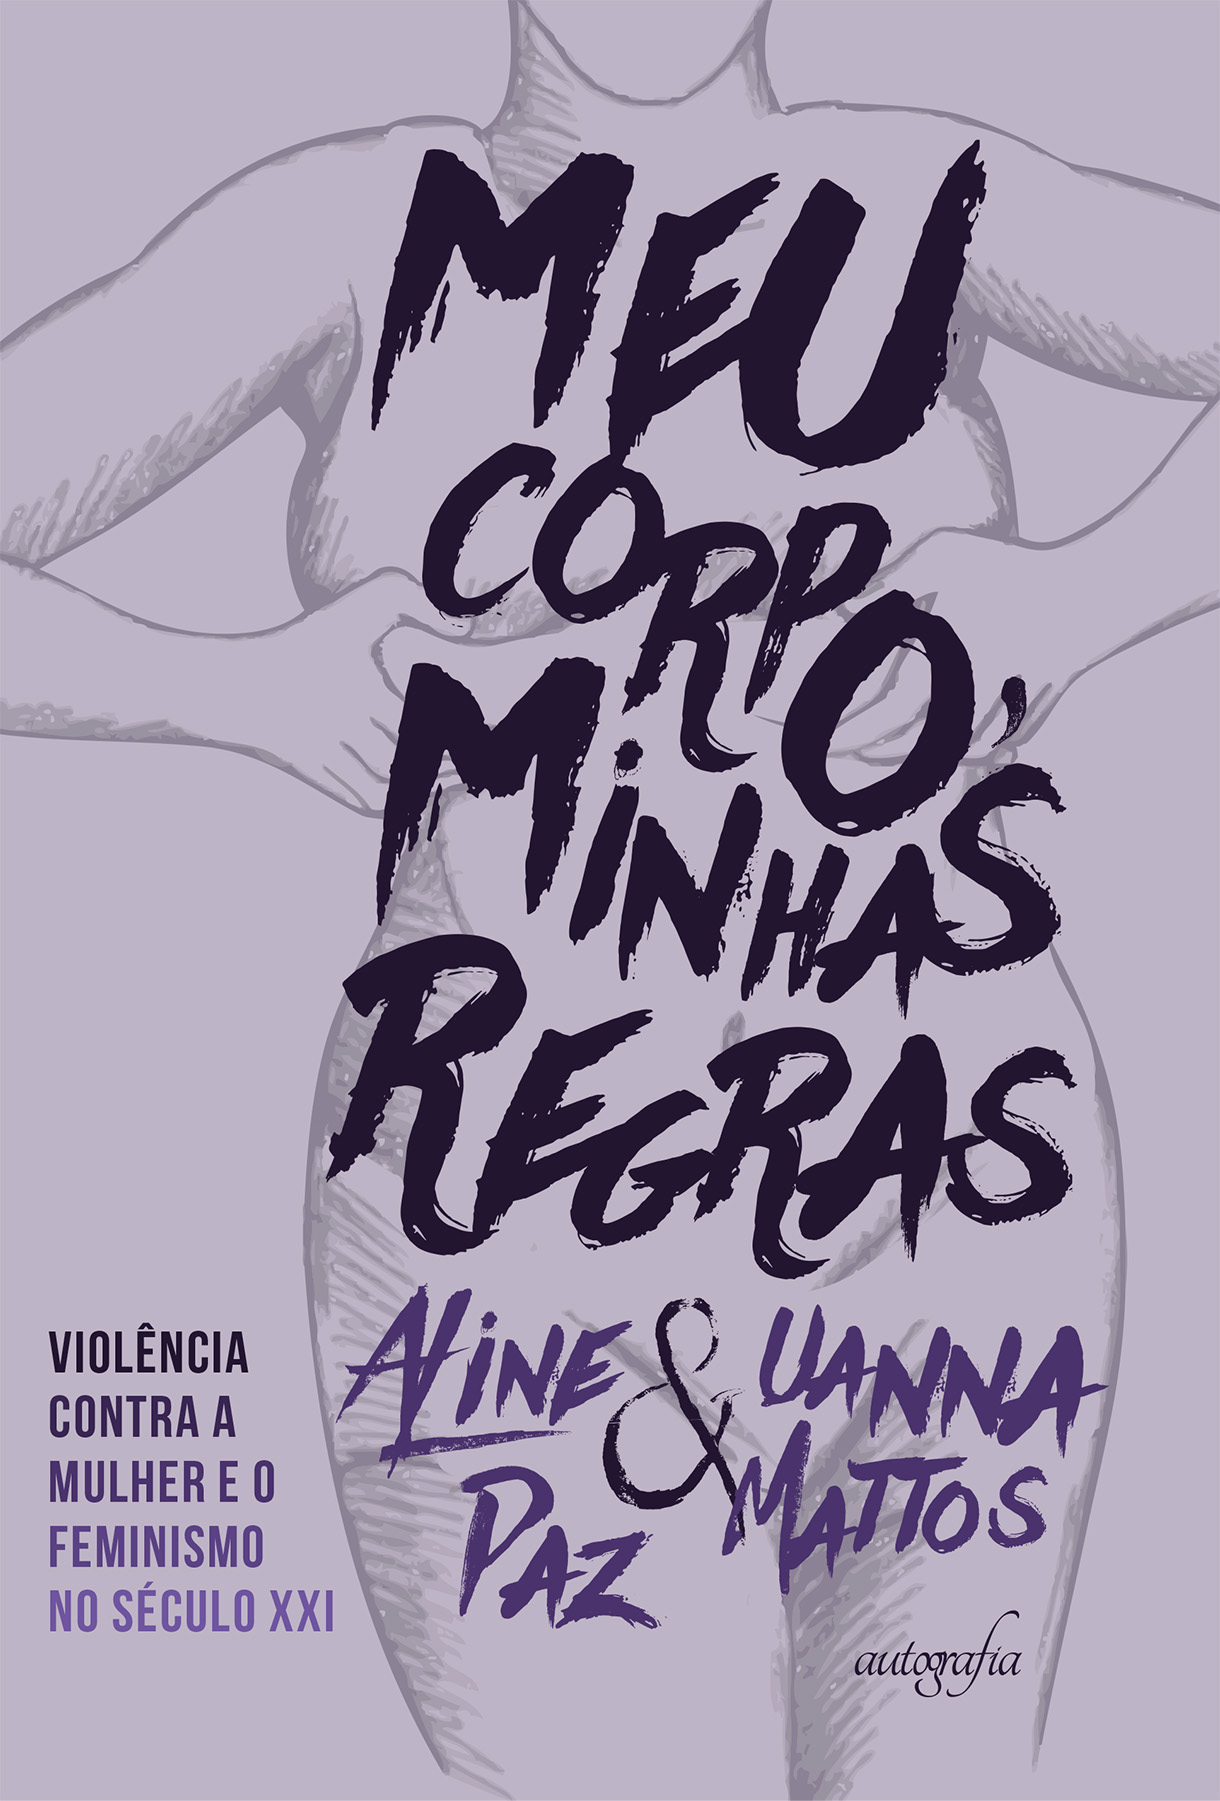 capa-alinepaz&uannamattos-meucorpominhasregras_19072016